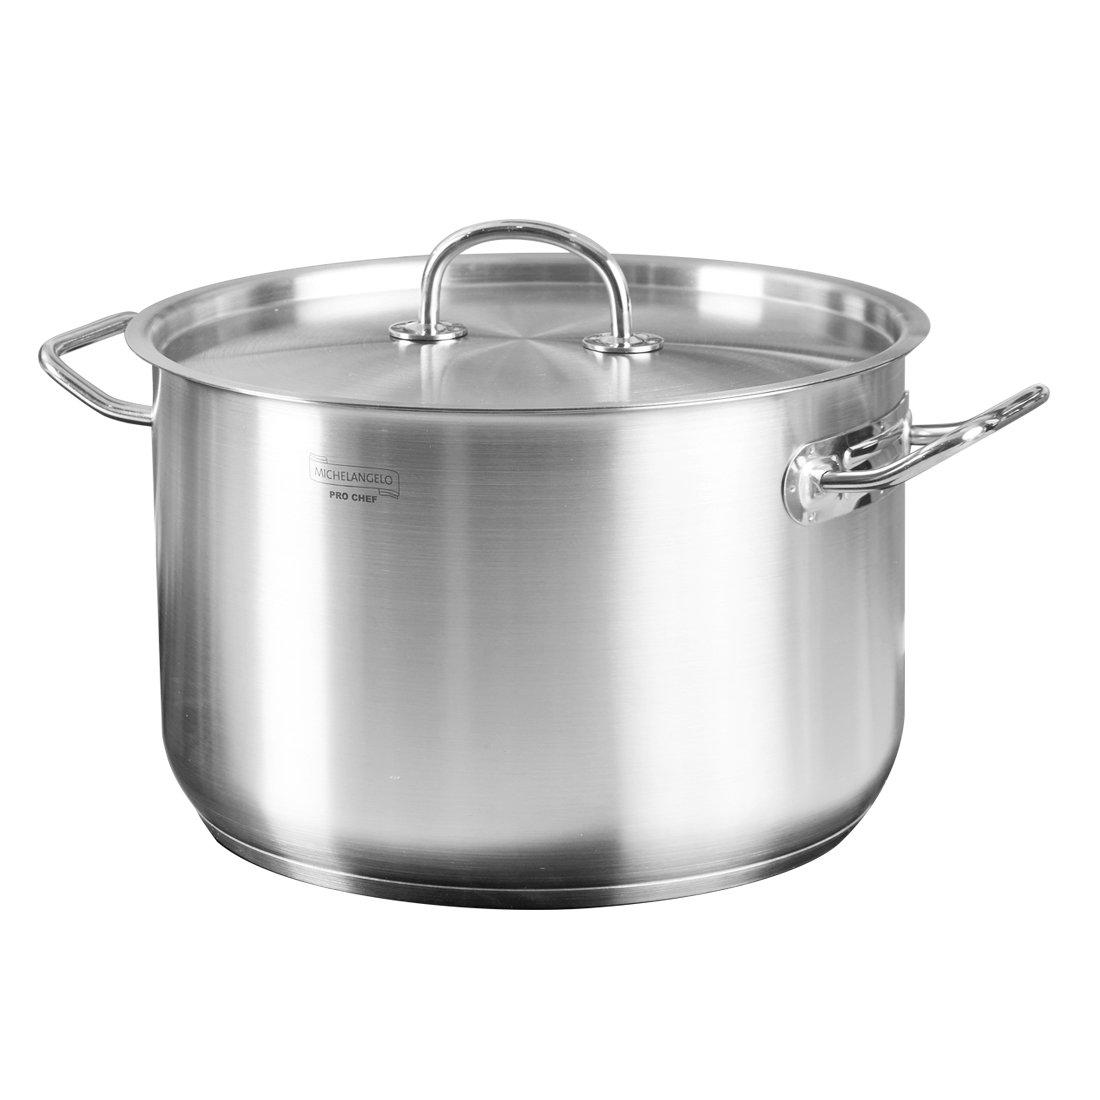 MICHELANGELO Premium Stainless Steel Stock Pot with Lid, Classic 10 Qt Stainless Steel Pot With Lid, Induction Cookware Large Pot, 10 Qt Stainless Steel Pasta Pot, Large Sauce Pan, 10 Quart Soup Pot